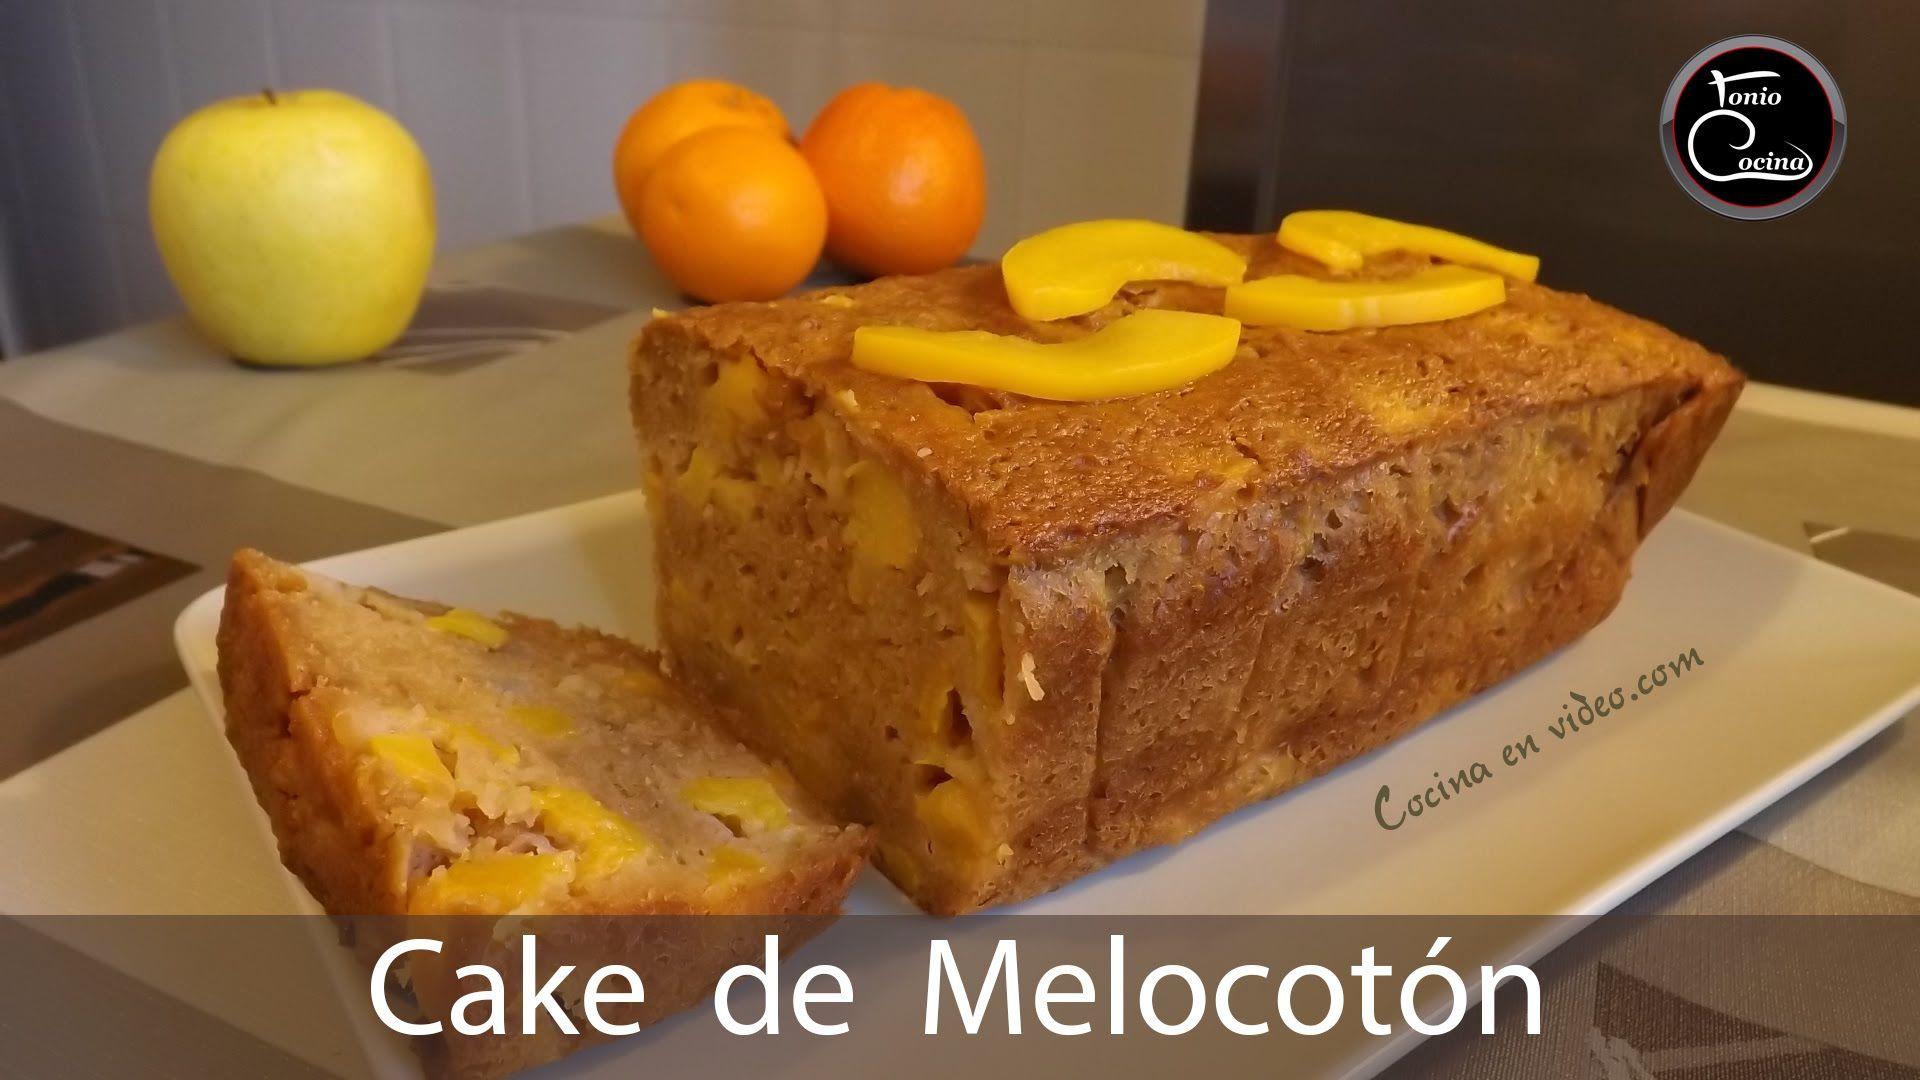 Cake de melocotón - Adelgazar con una Dieta sana - Peach cake  |  #Toni...